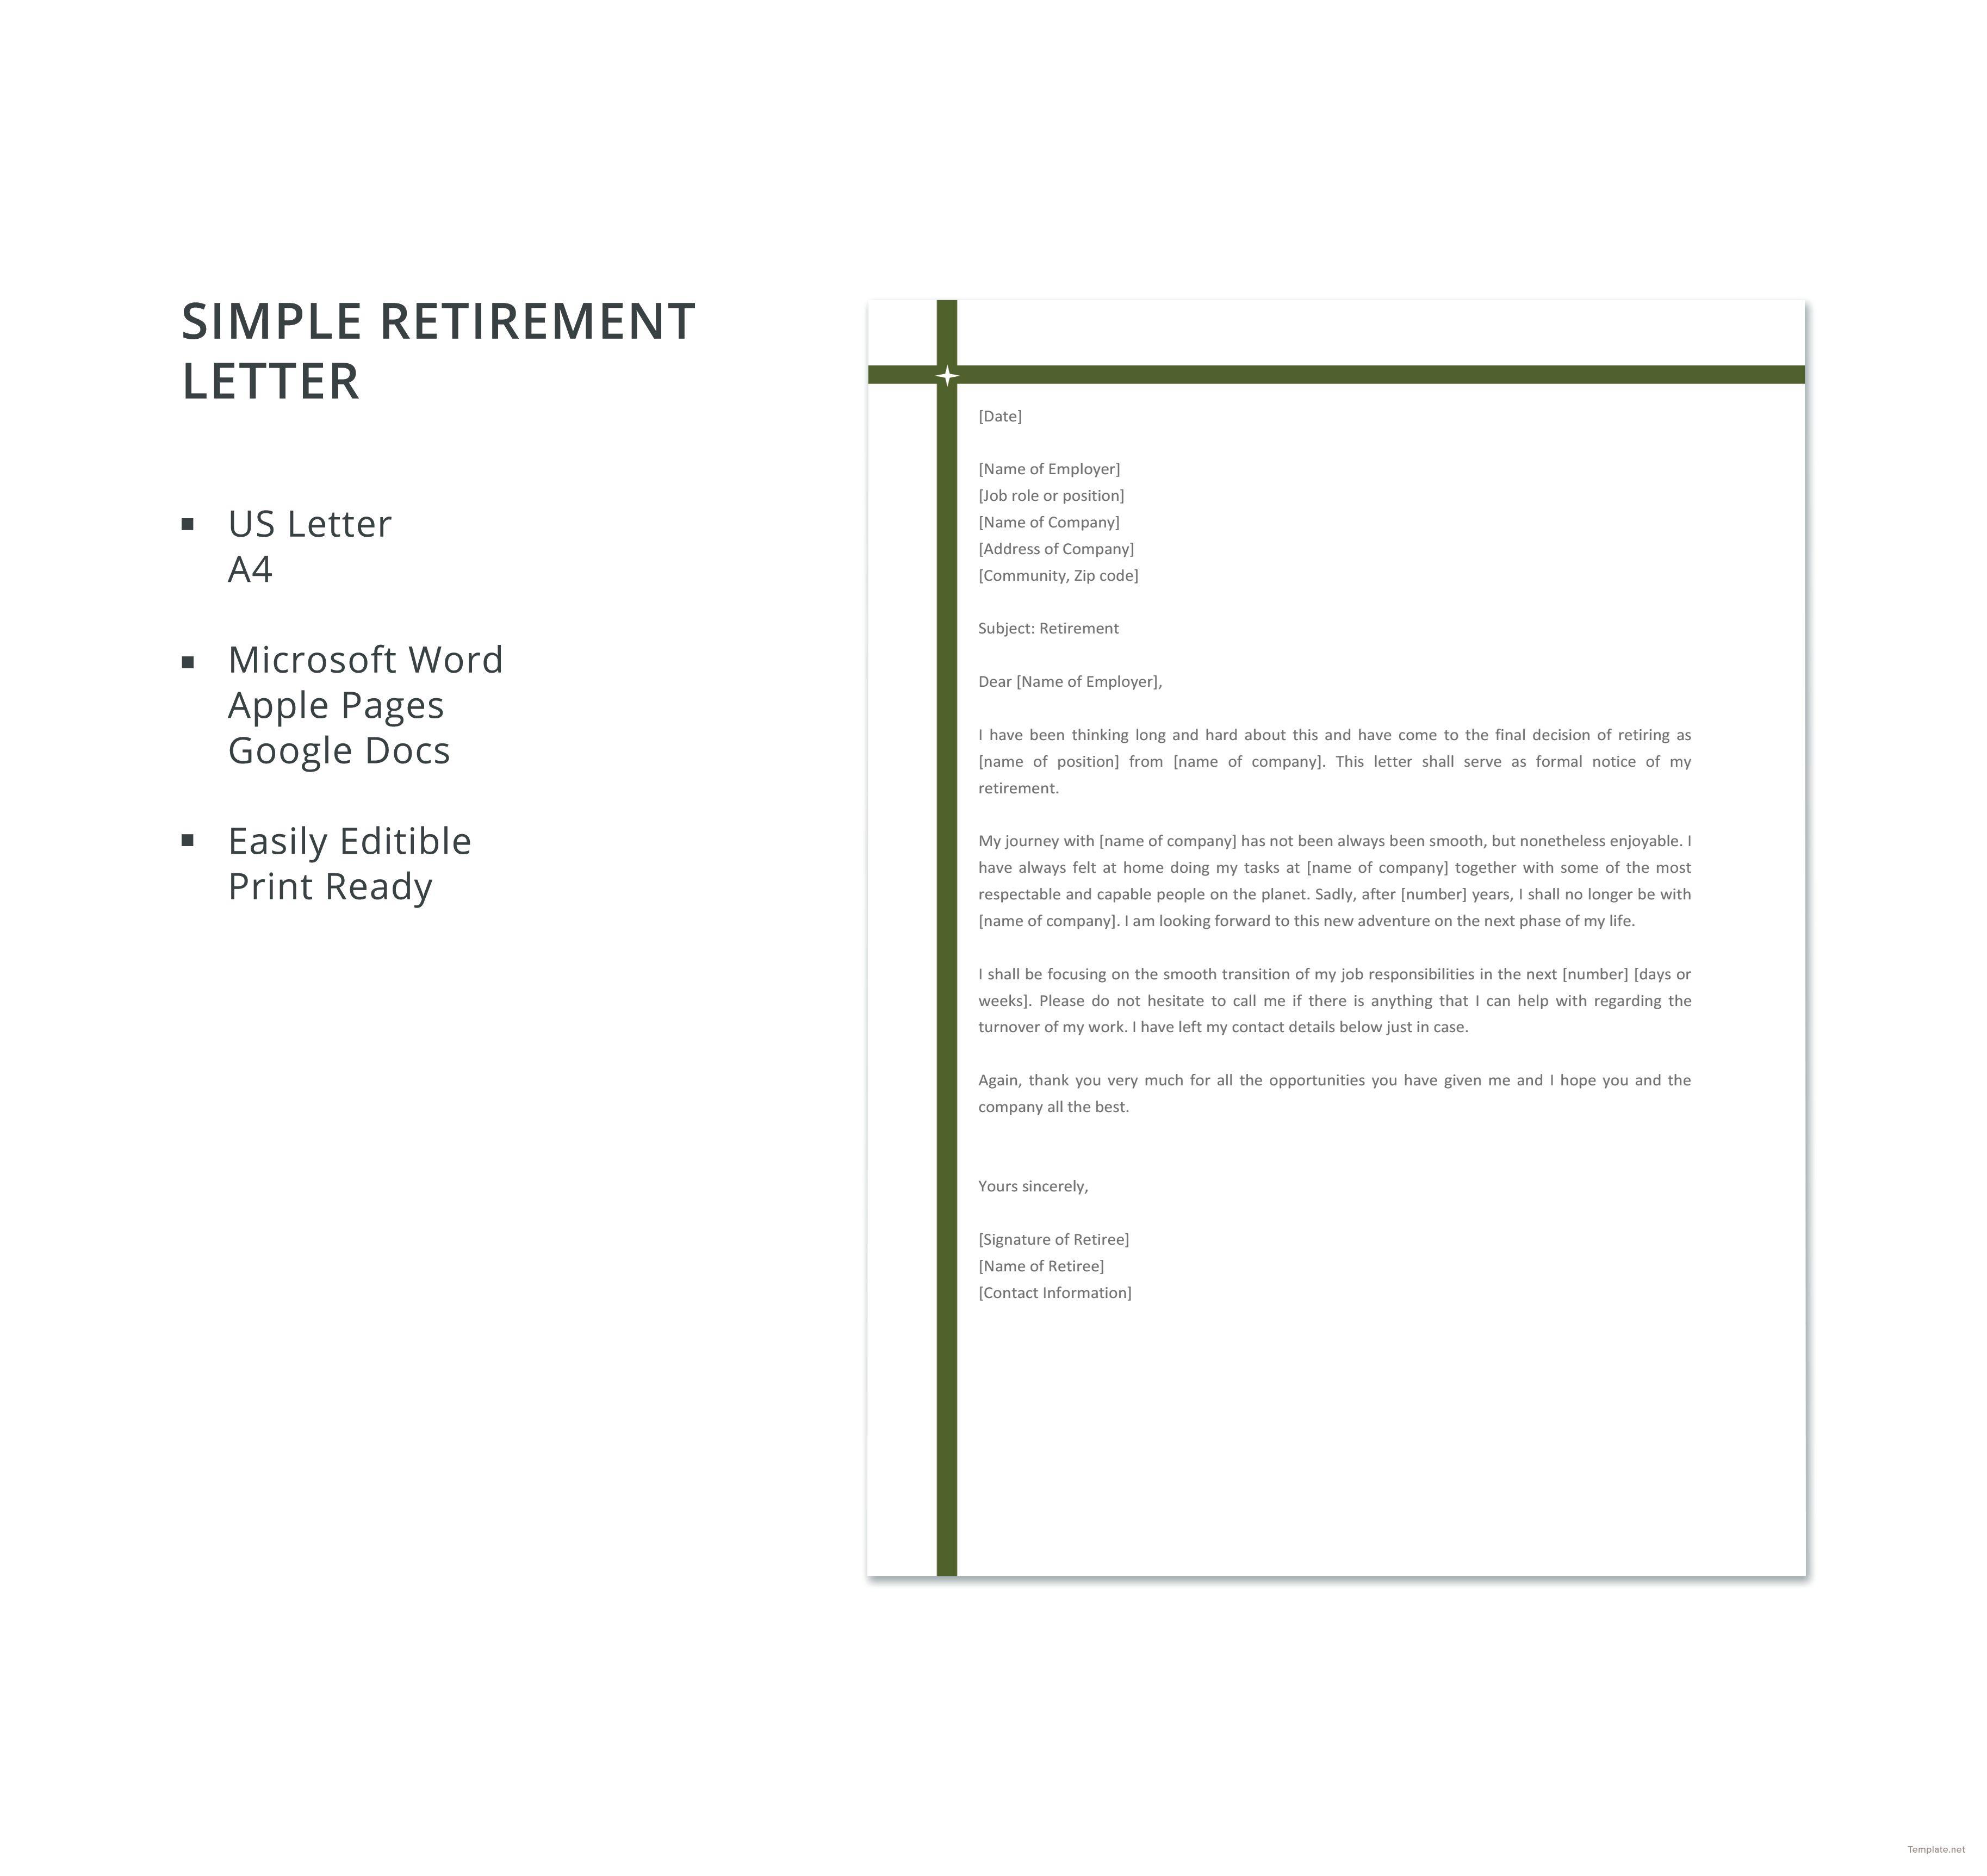 free simple retirement letter resignation blank cv template download cna resume description good opening statement for